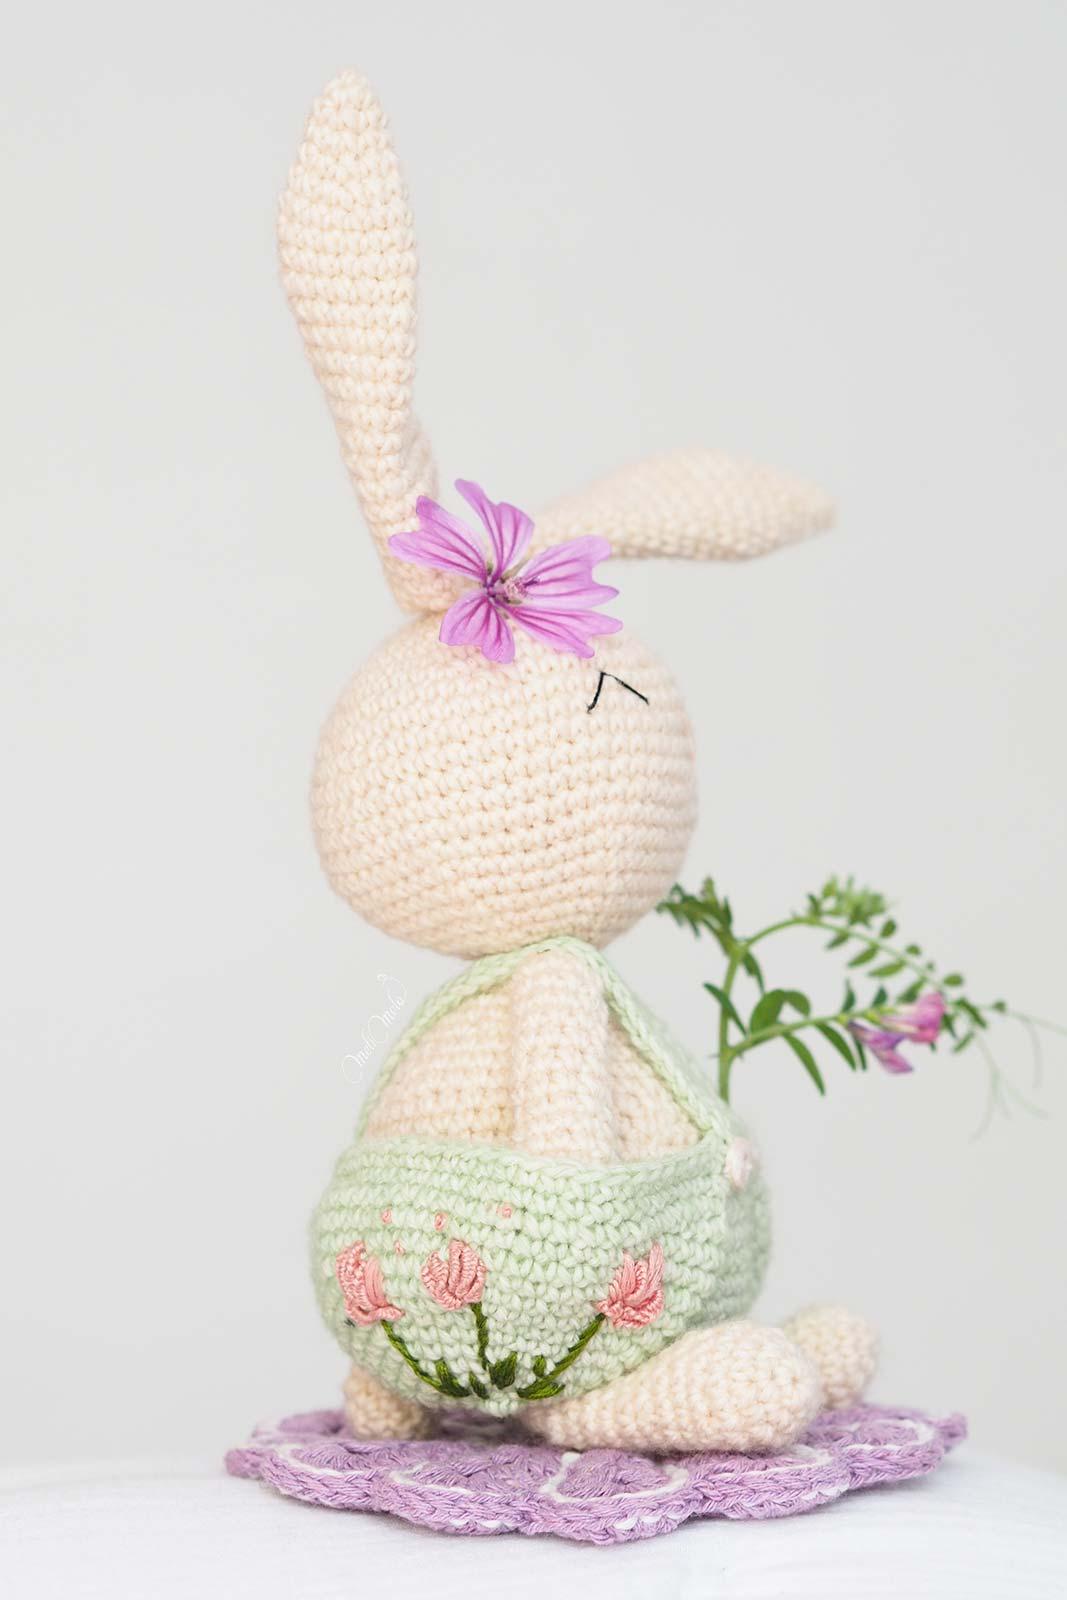 broderie-pivoines-lapin-amigurumi-crochet-laboutiquedemelimelo